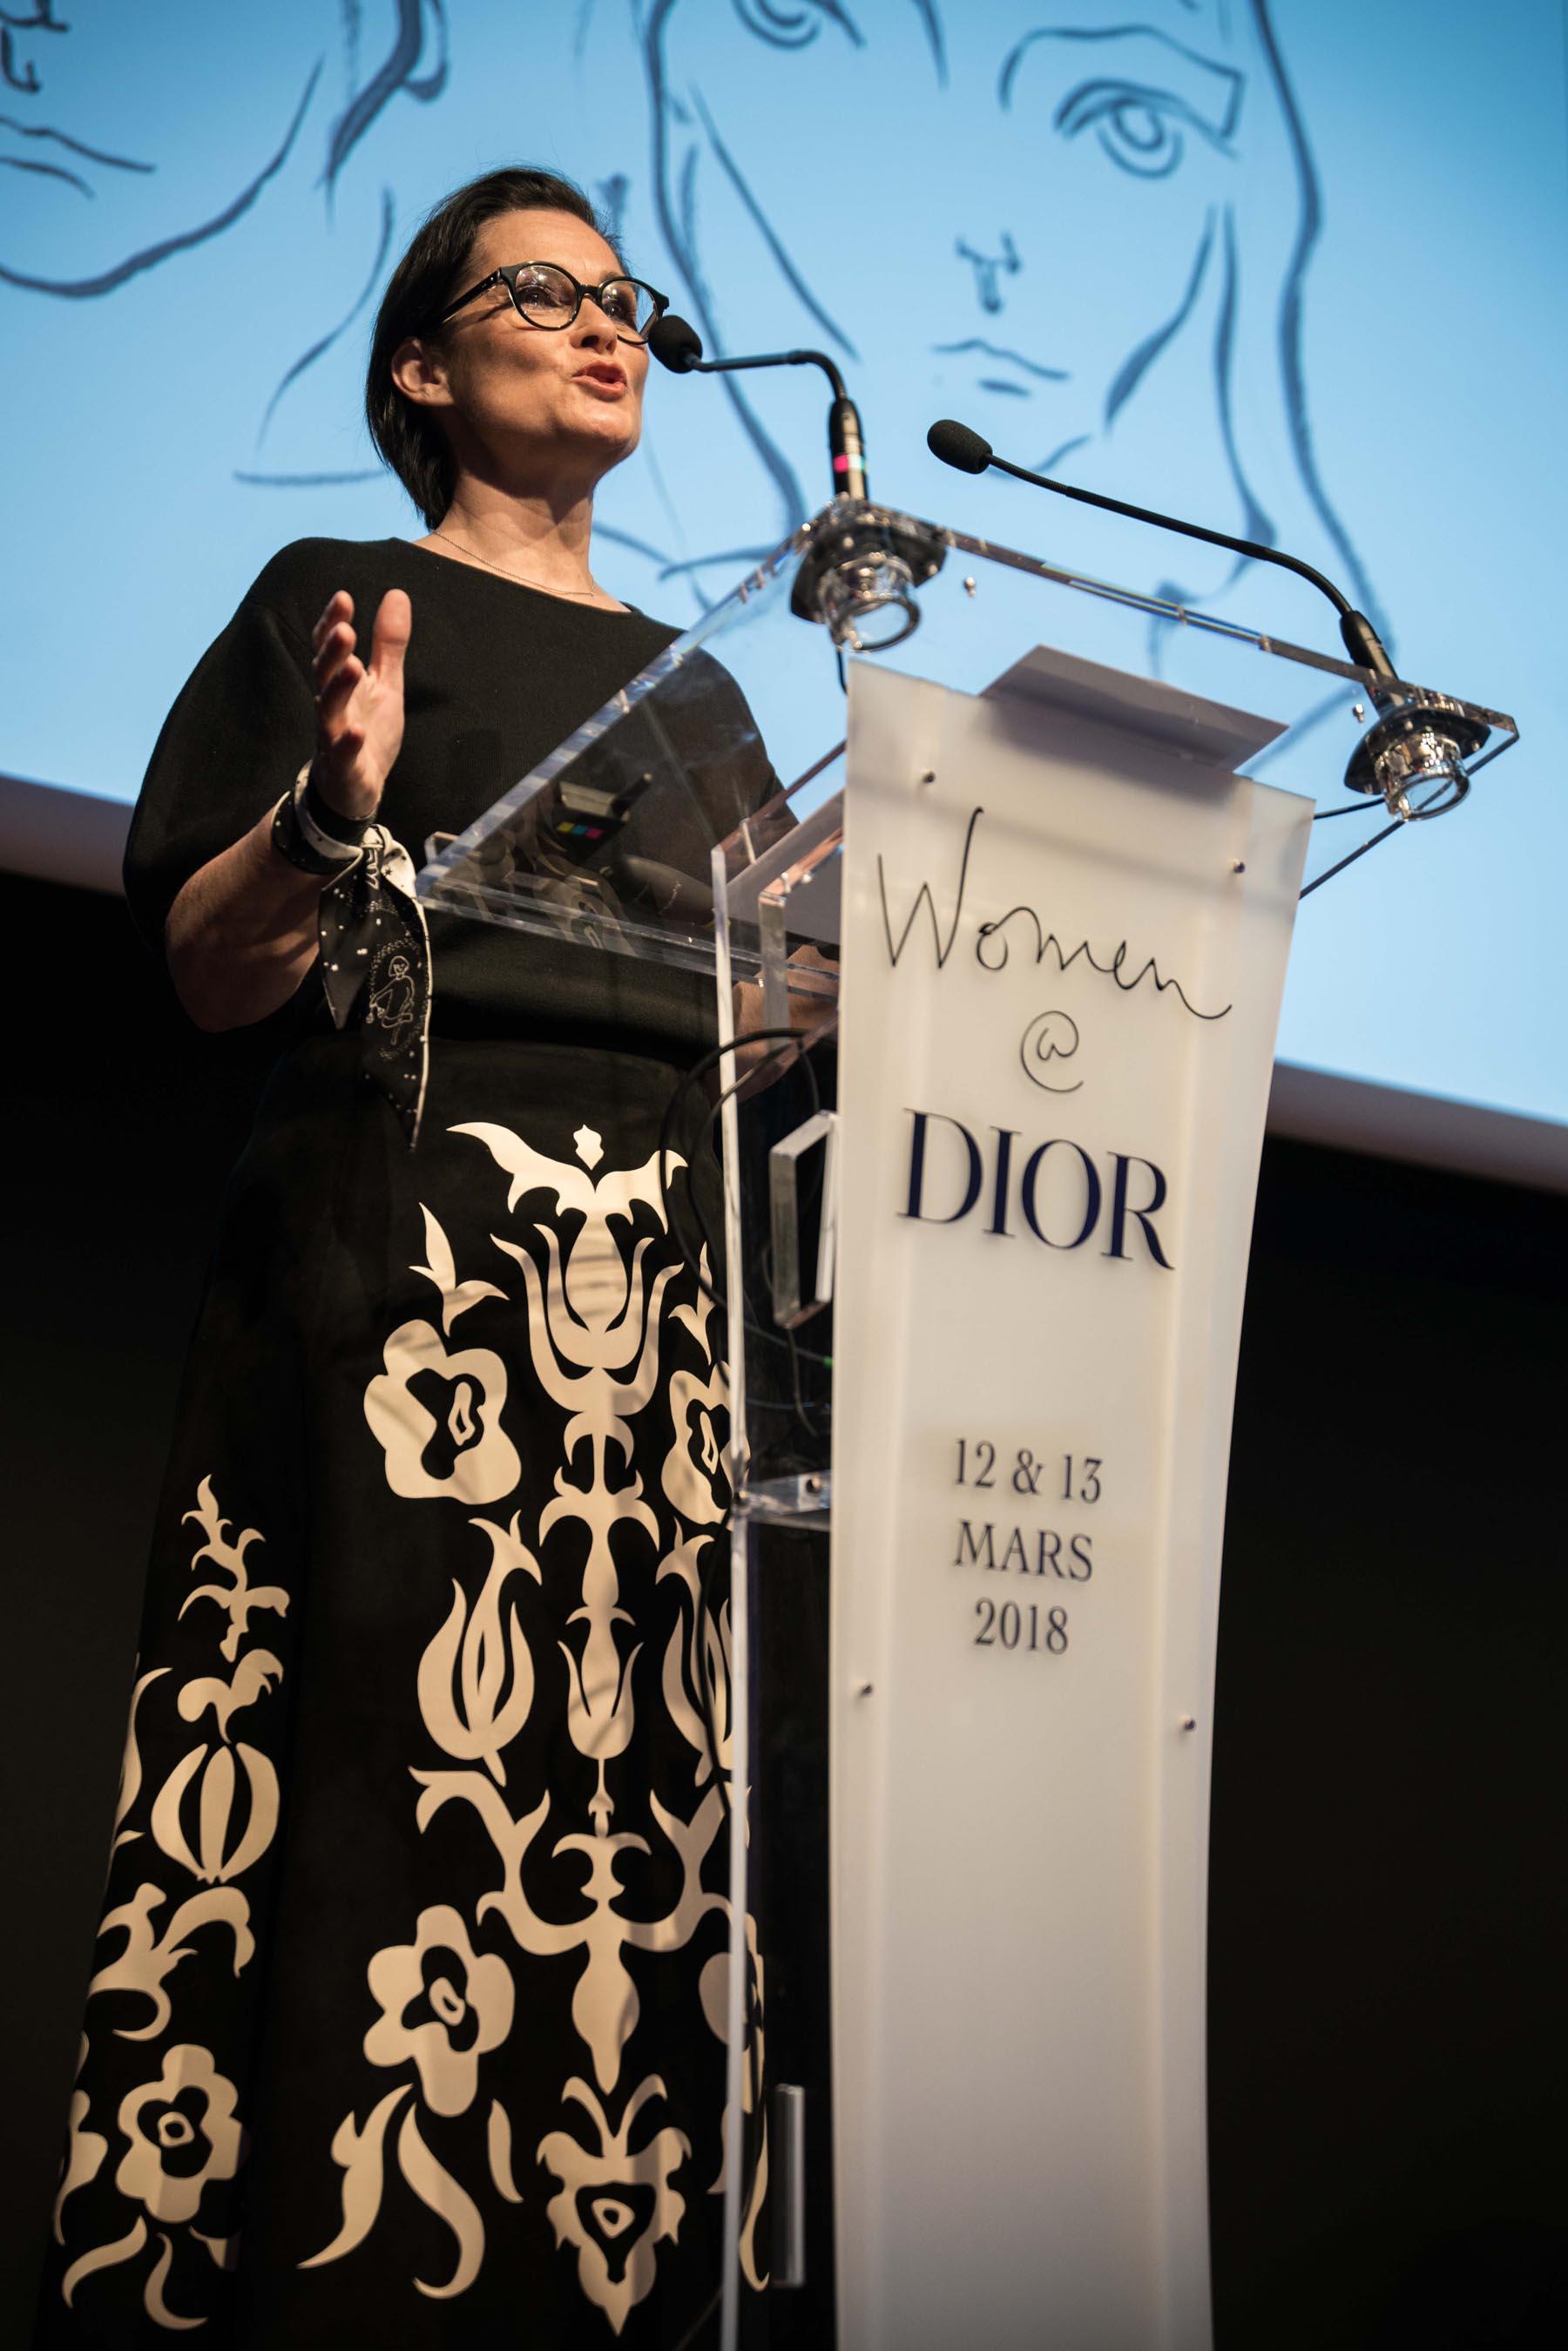 Dior Women@Dior Mentorship Program Returns